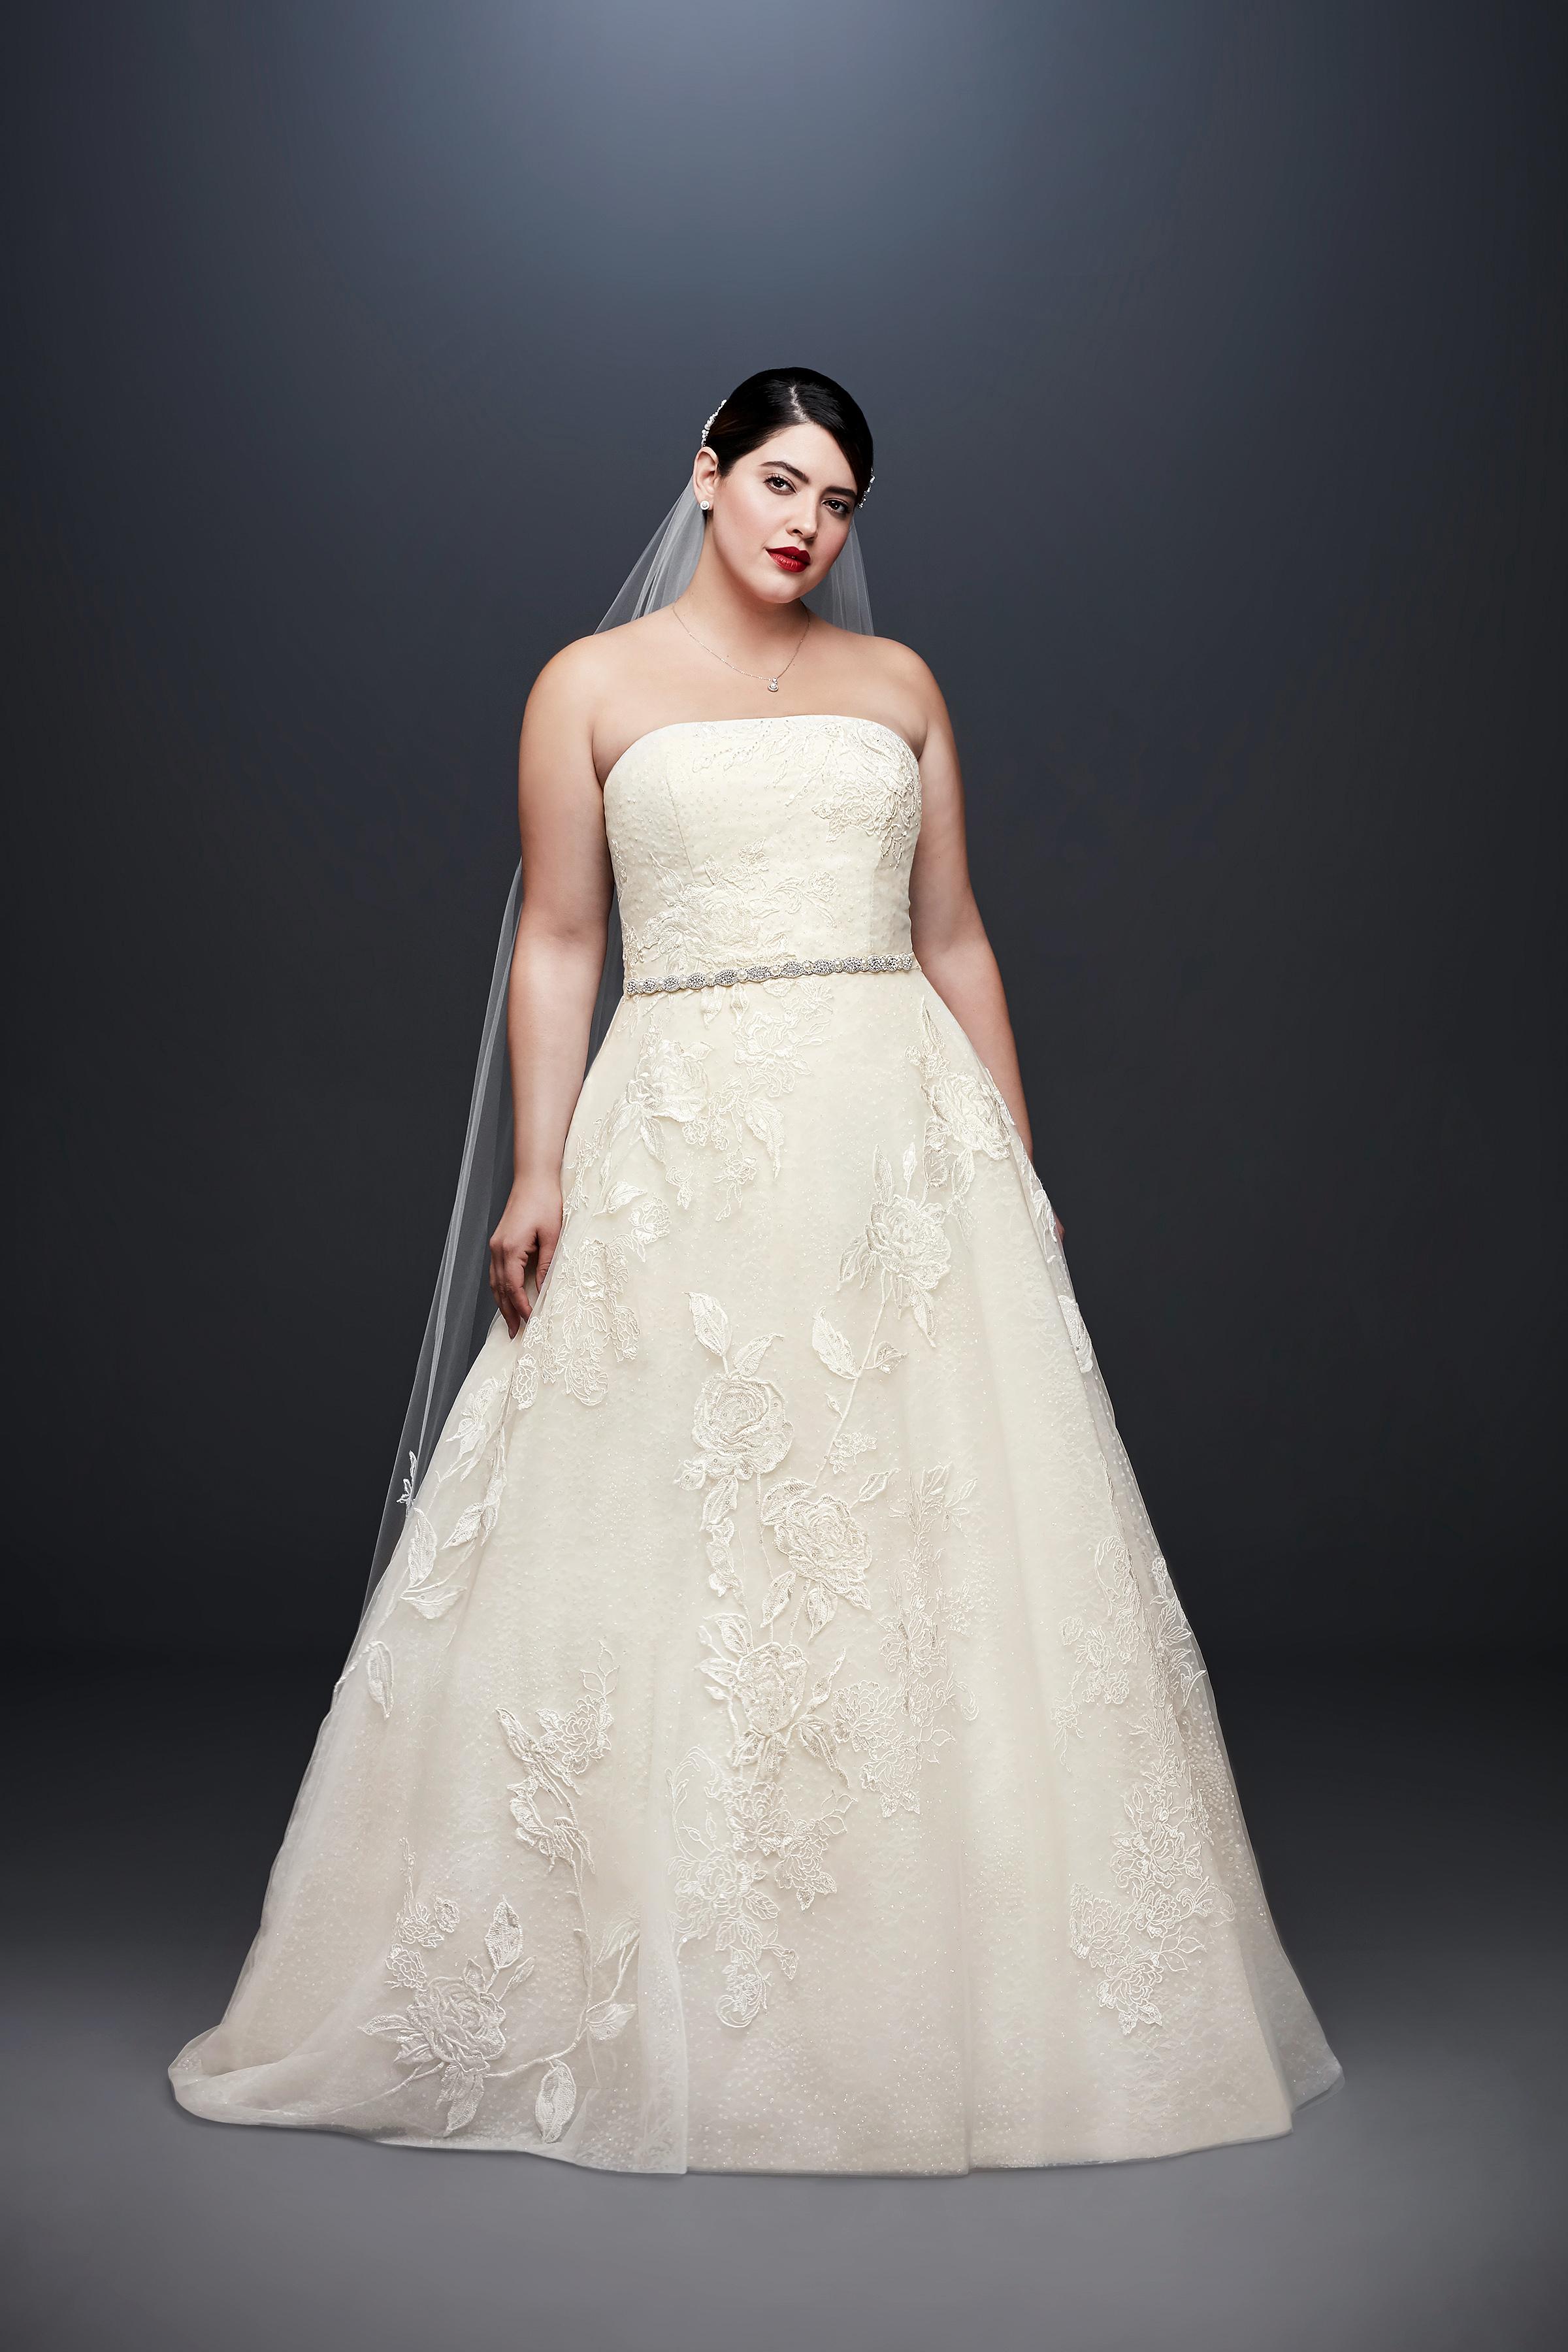 david bridal wedding dress spring 2019 lace a-line strapless